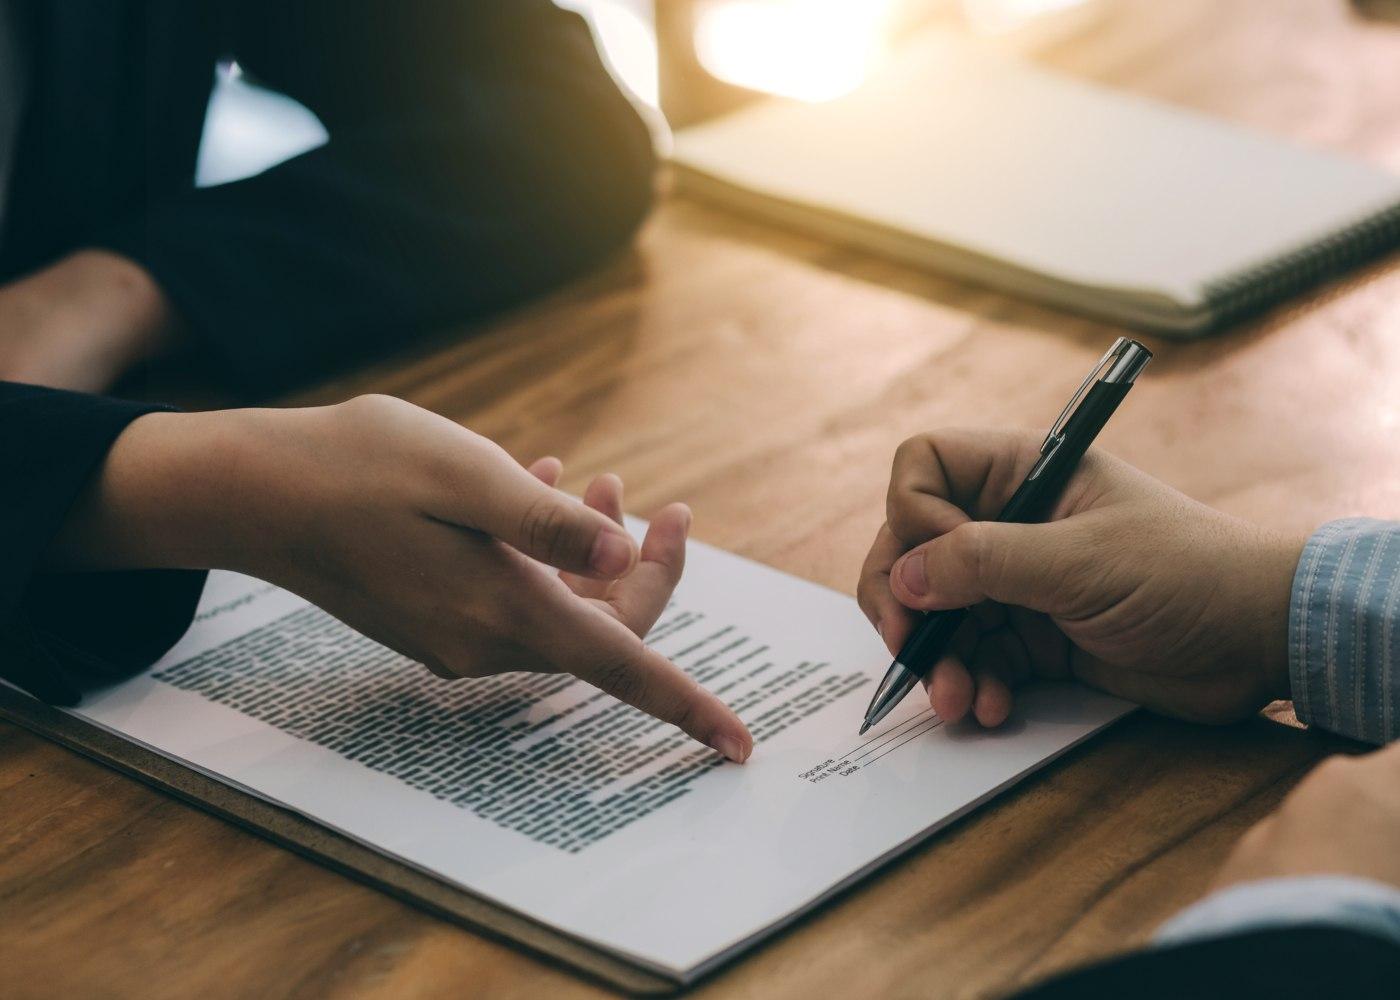 empregadora a explicar cláusulas do contrato a novo funcionário